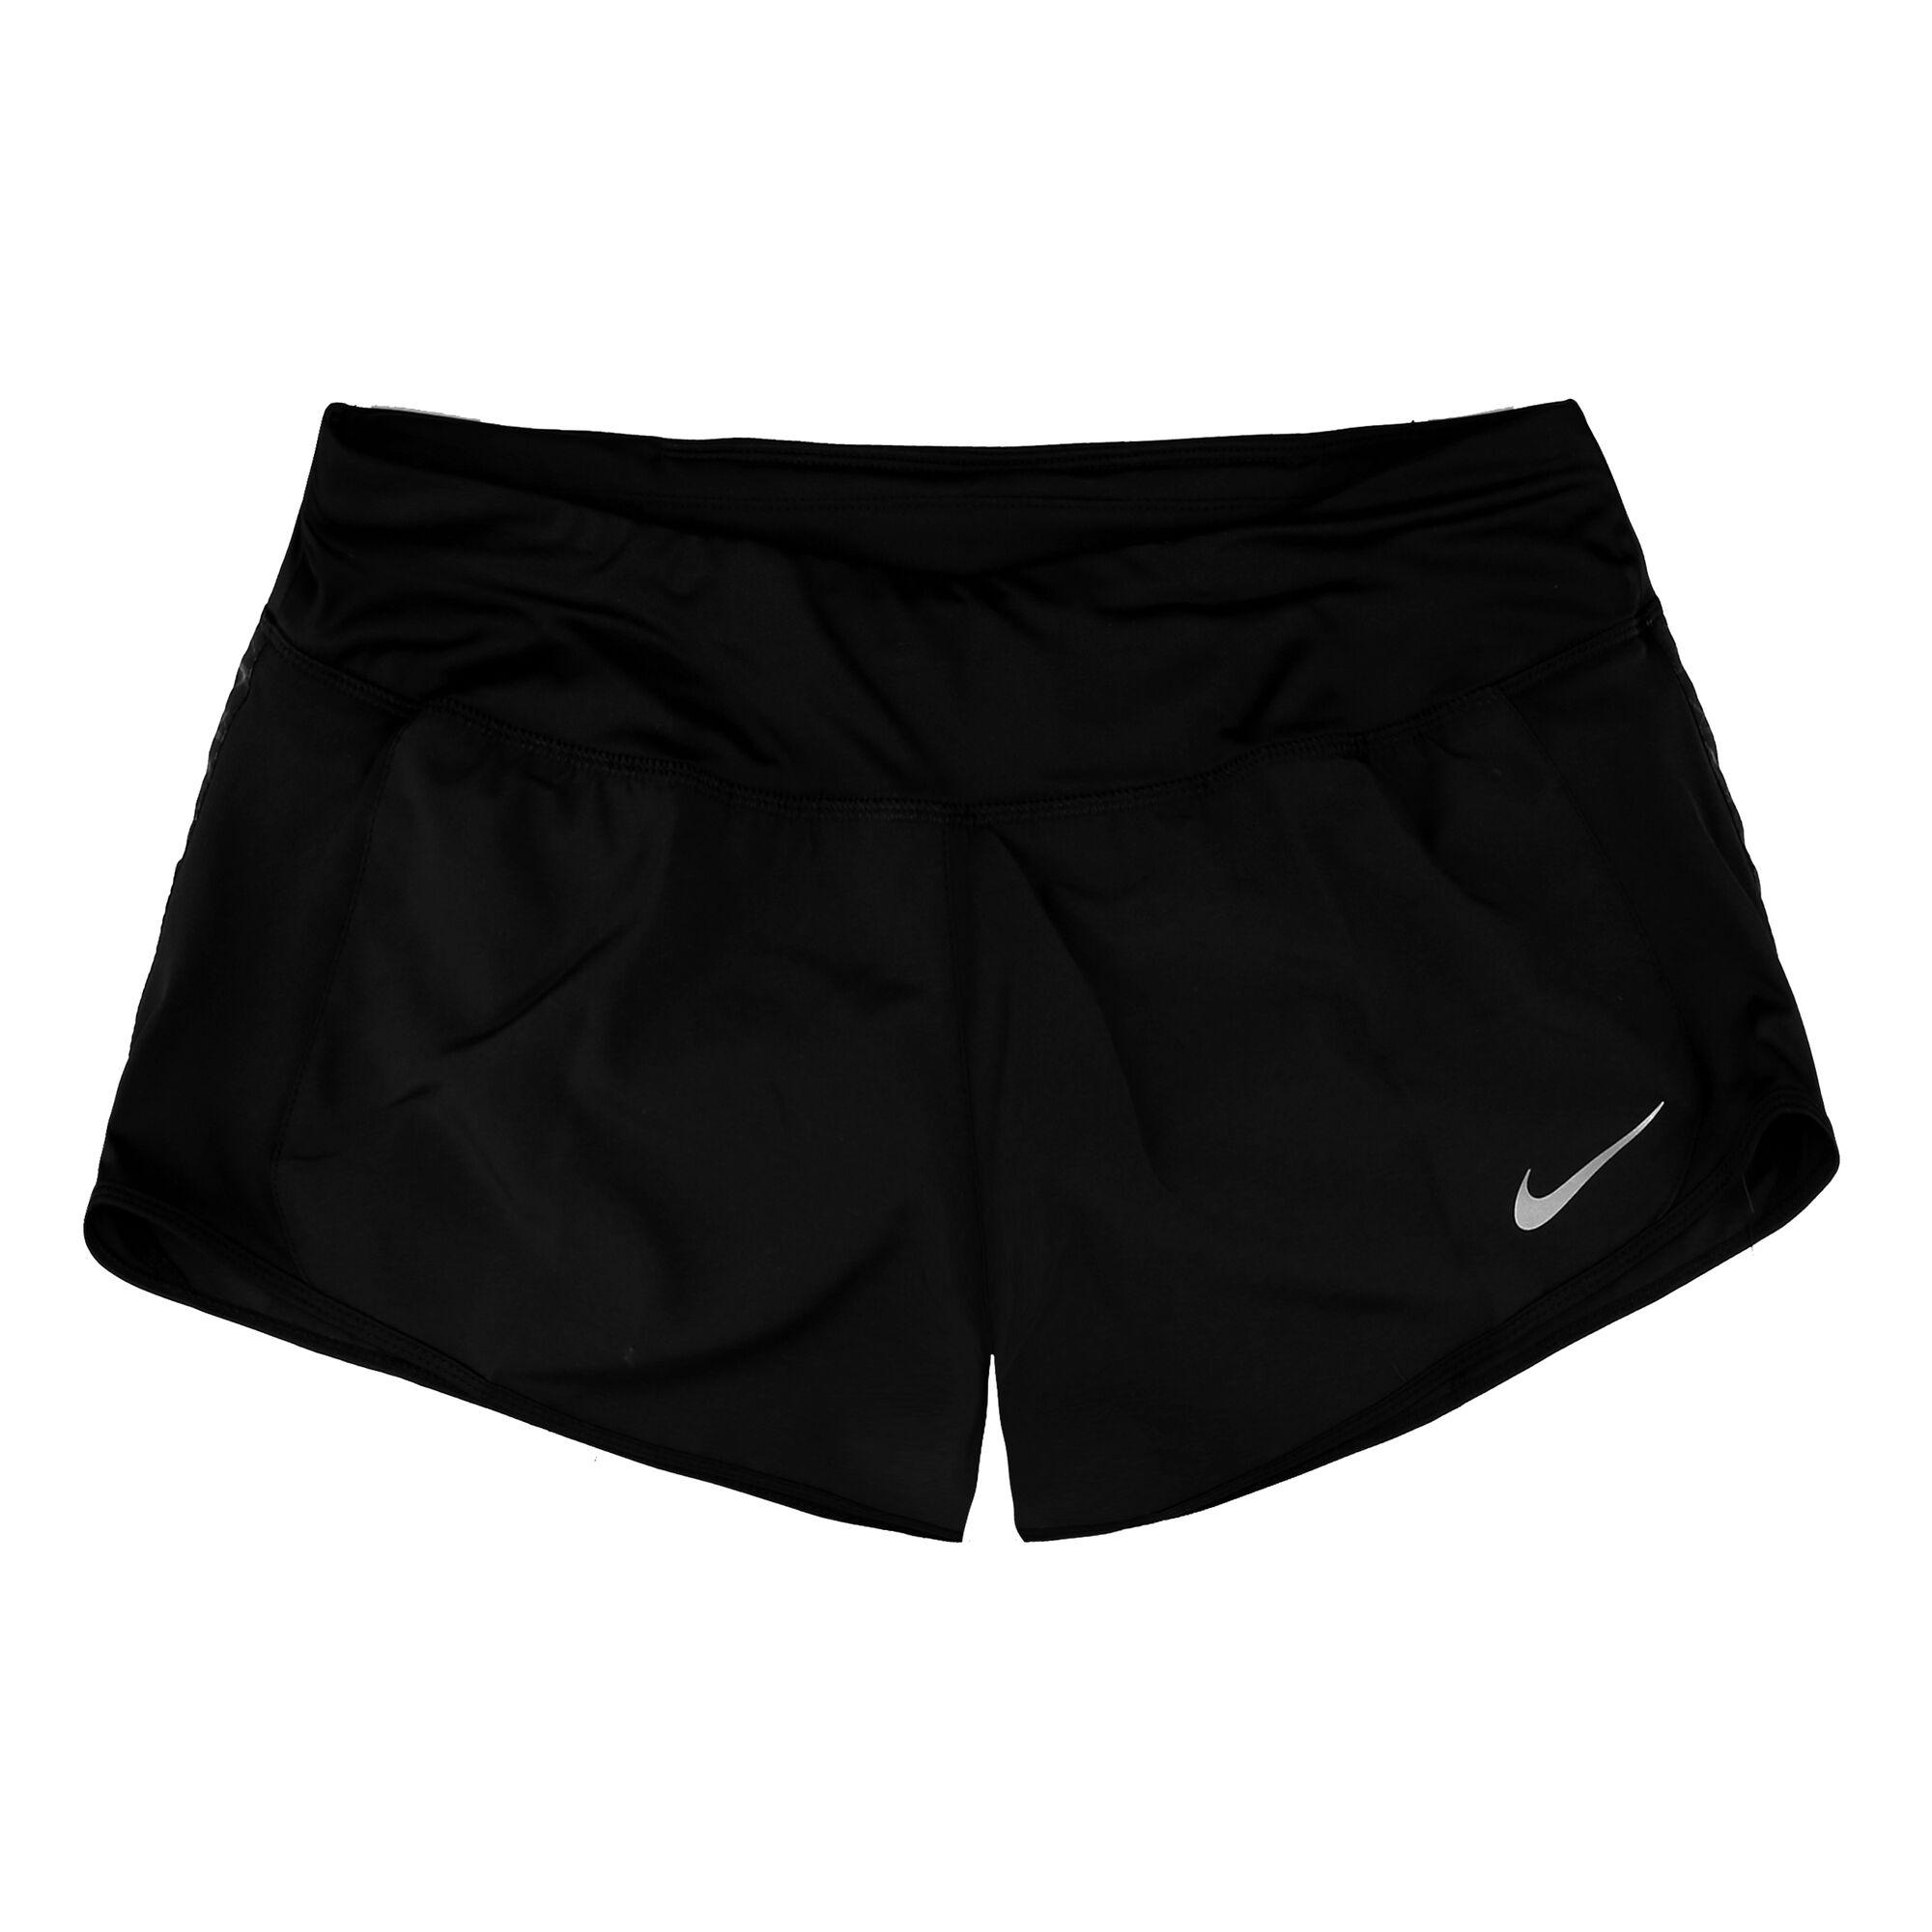 c0ade807a7 buy Nike Dry Shorts Women - Black